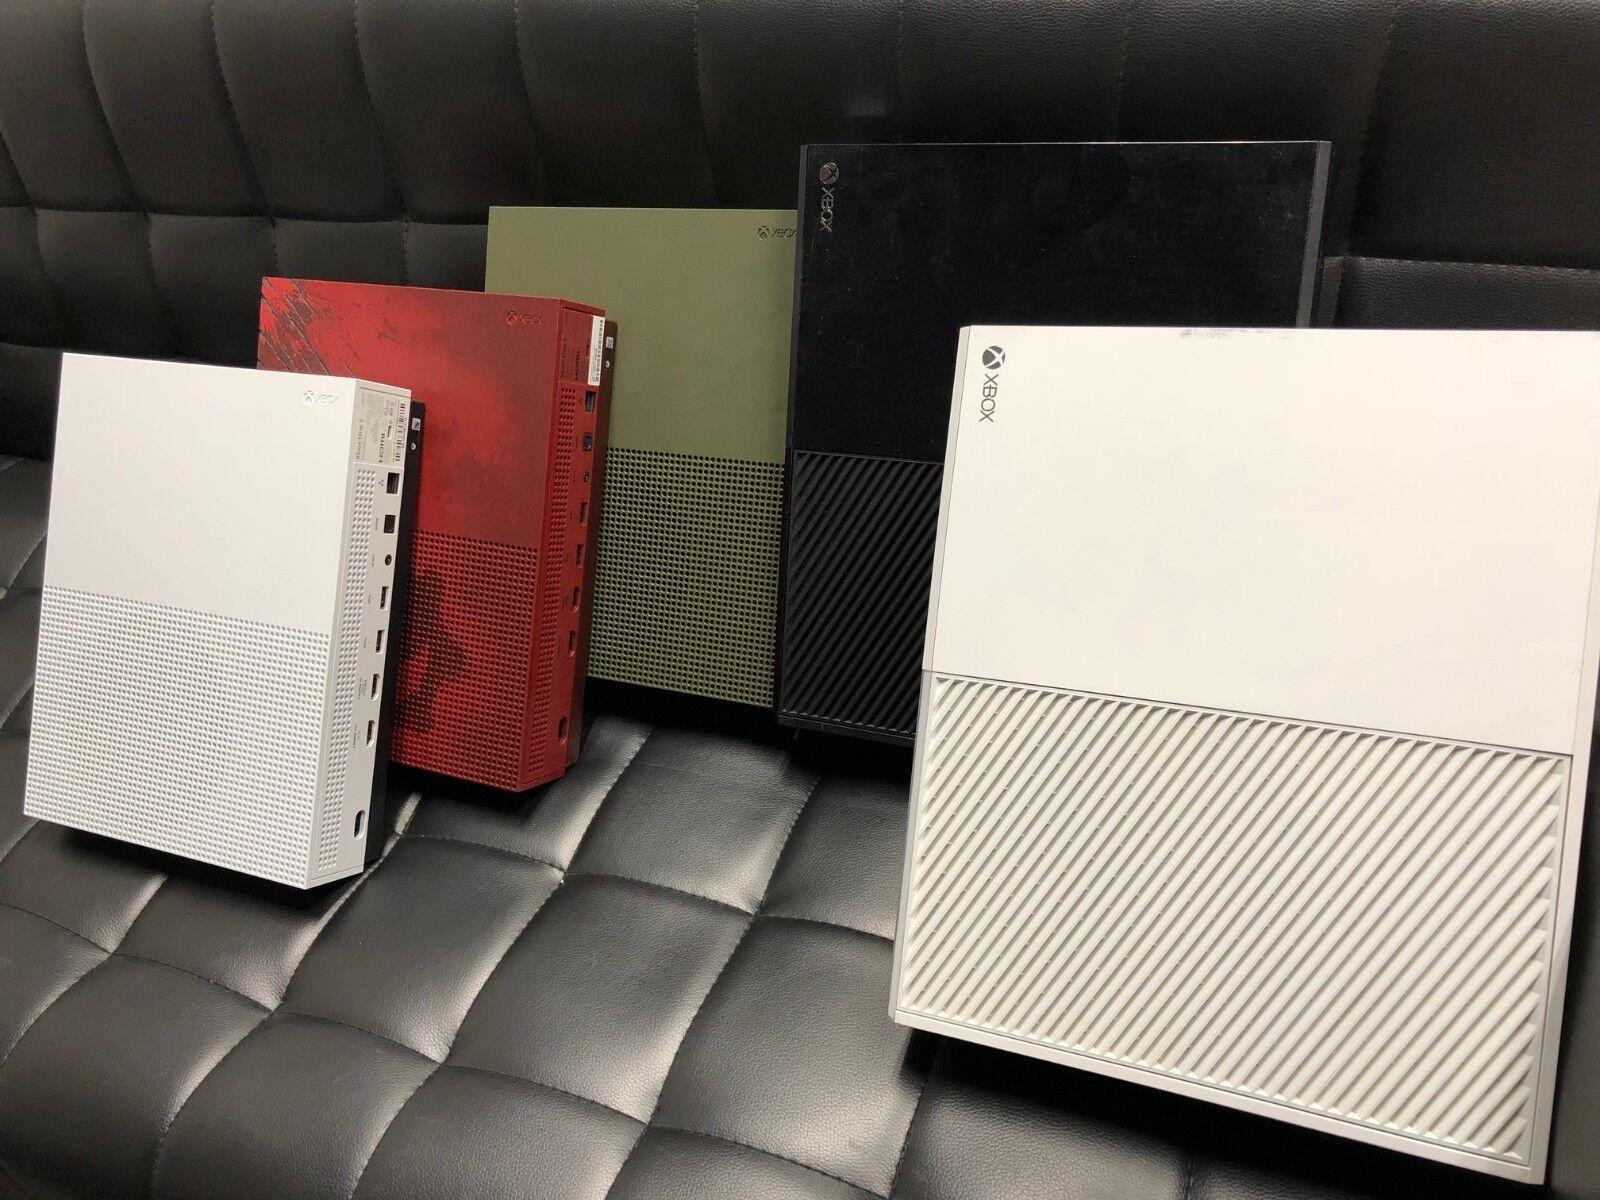 Microsoft Xbox One or One S Black  White 1TB 500GB Console Controller SE Edition